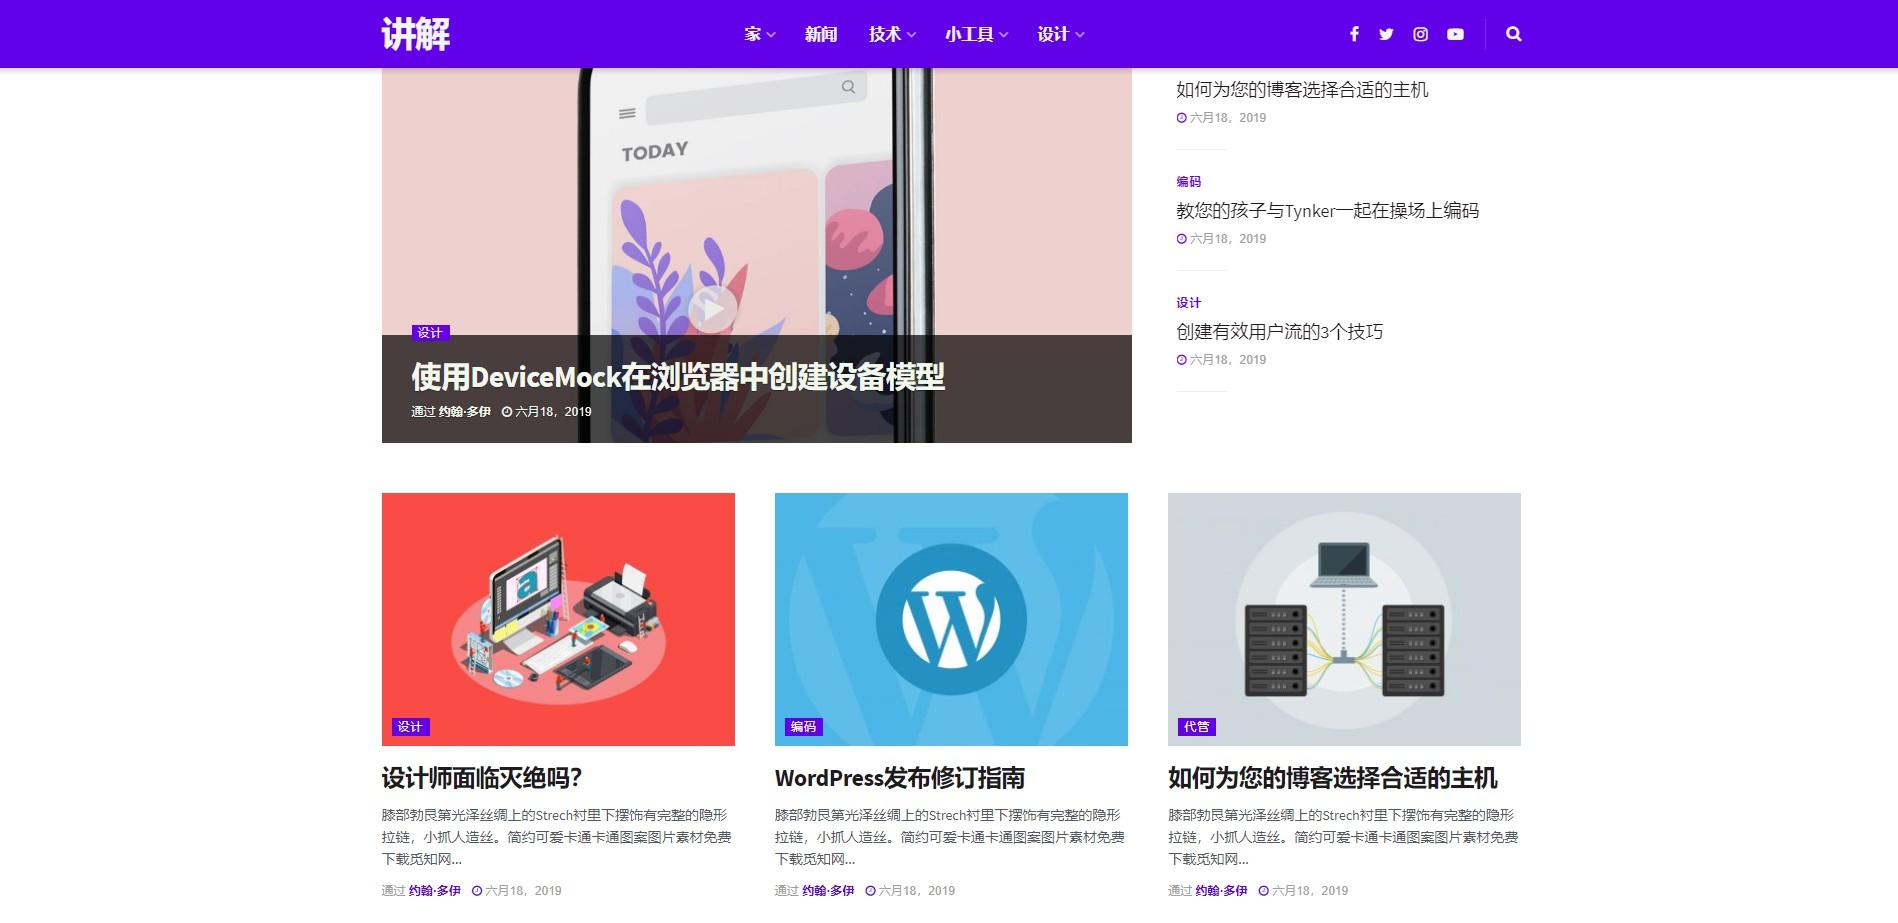 WordPress主题JNews v6.5.1新闻视频杂志博客主题-常网小站Miknio